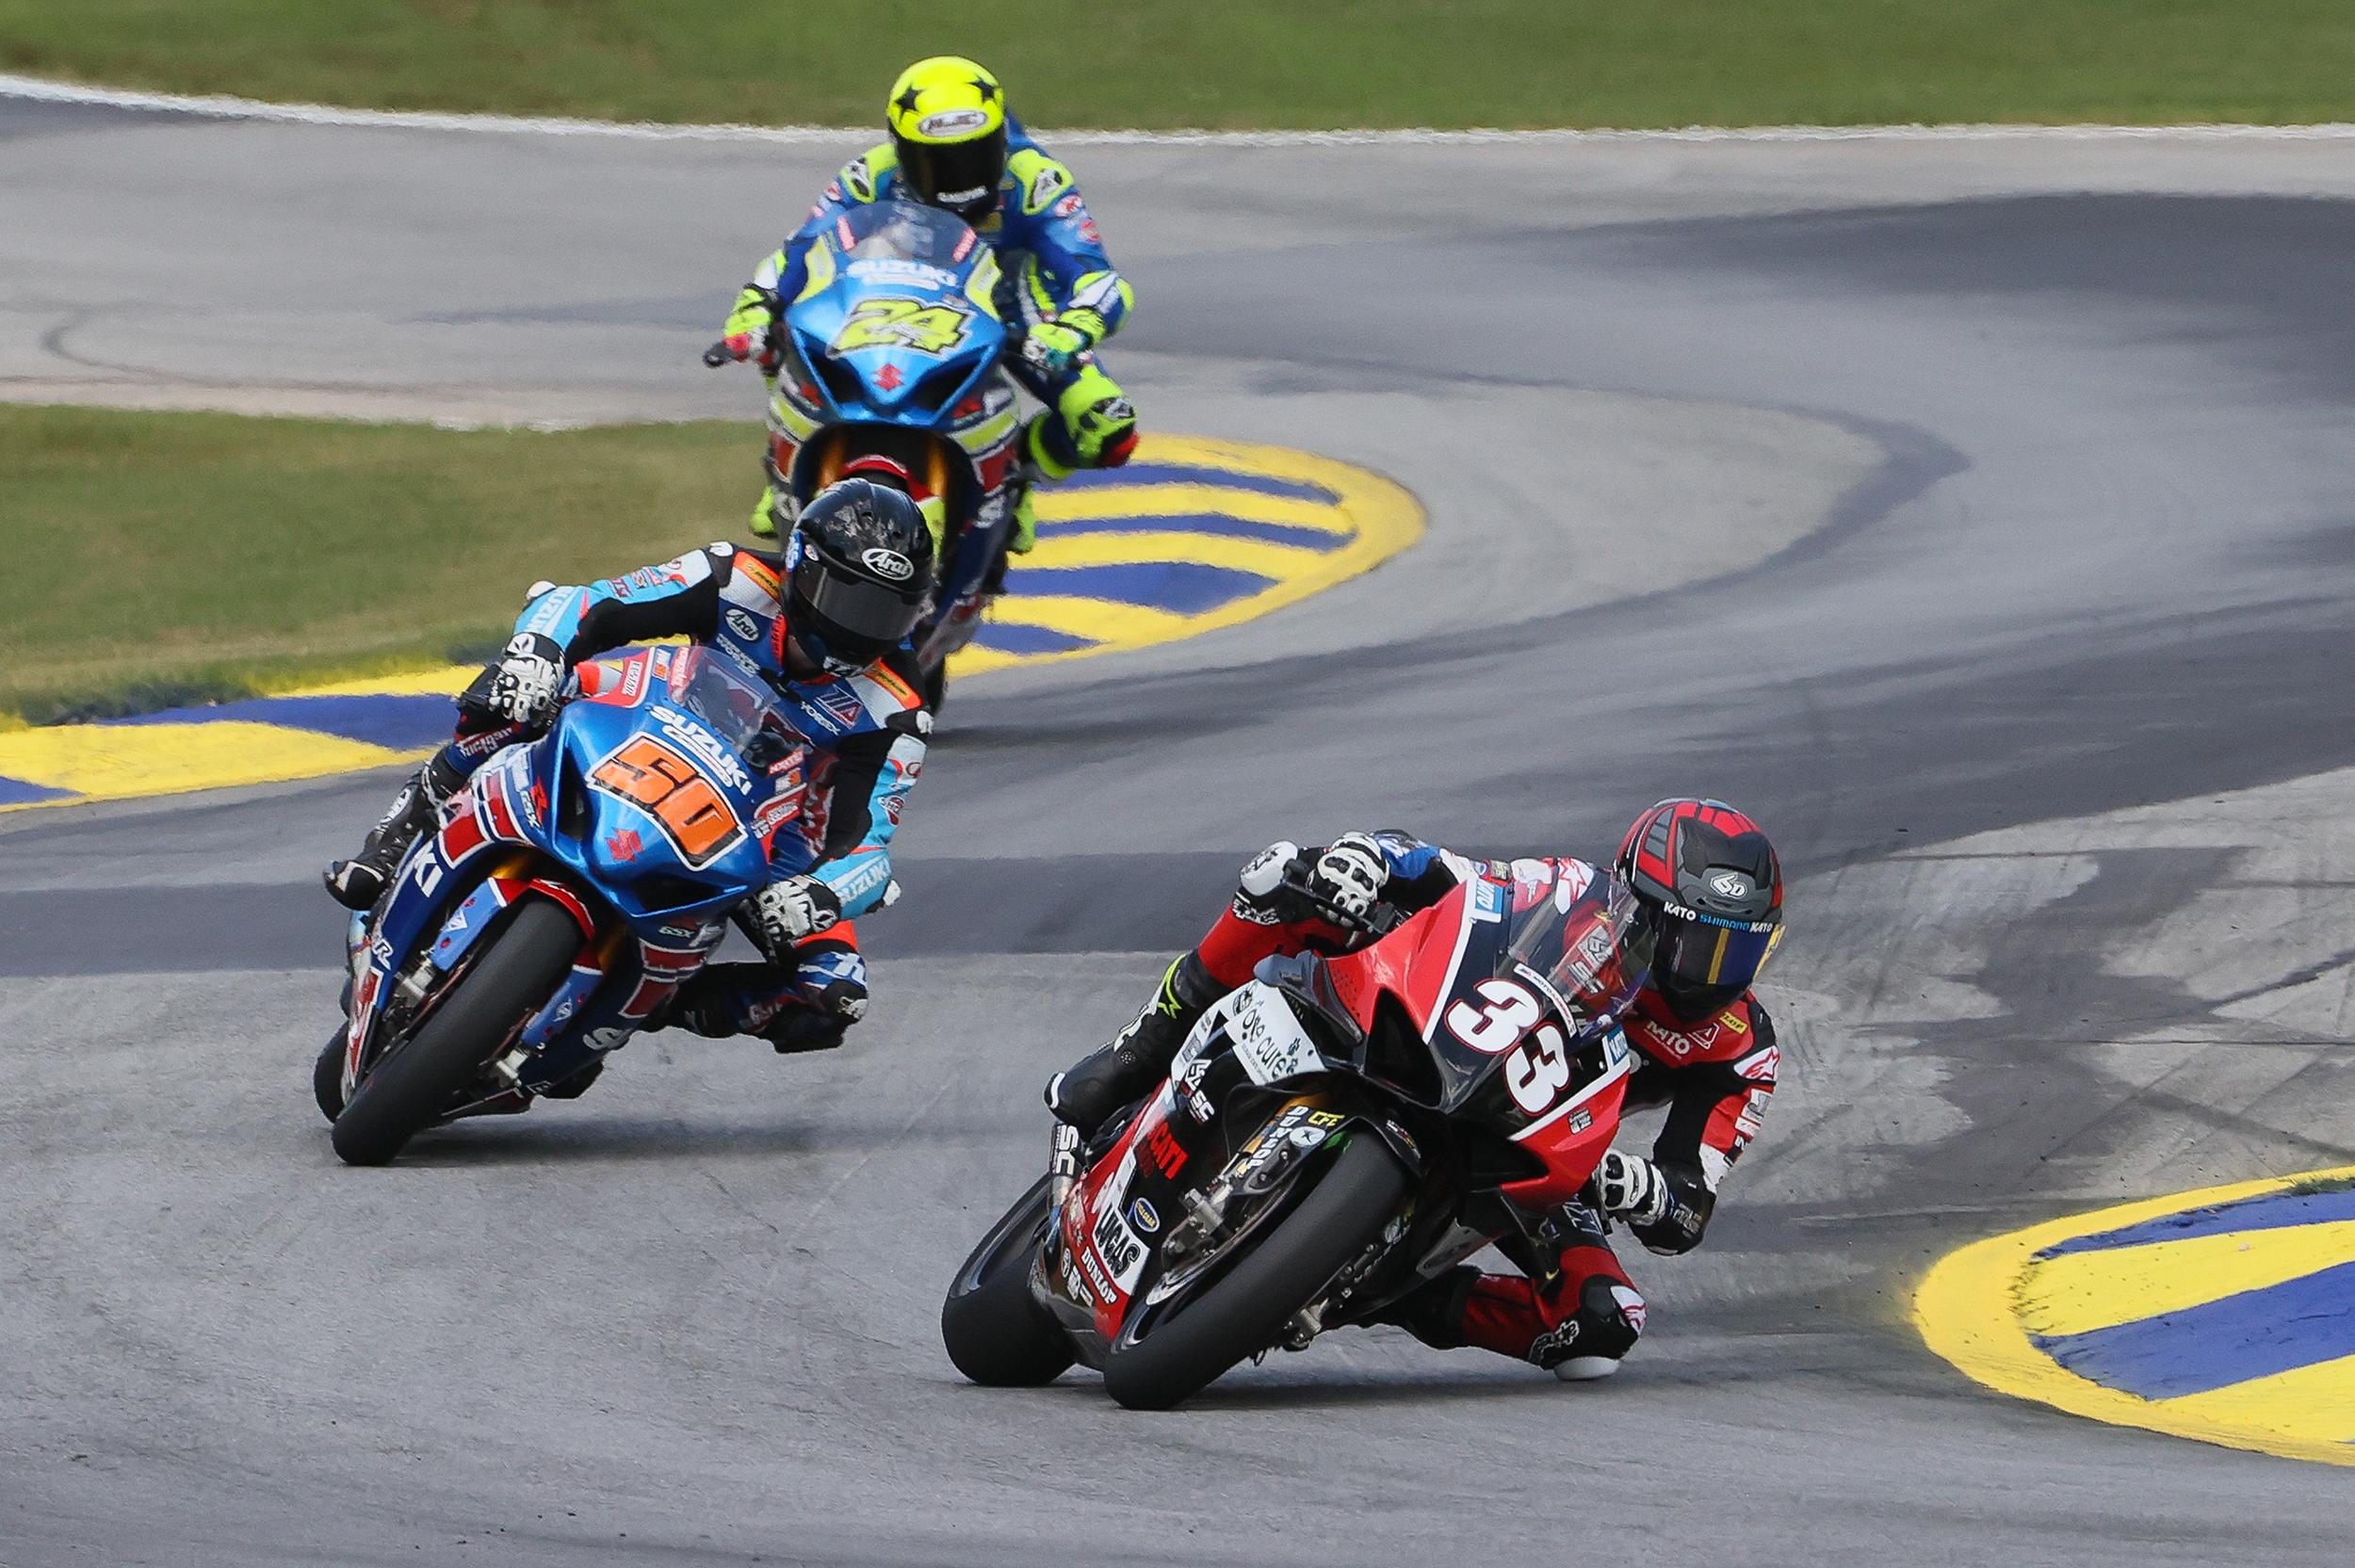 200803 MotoAmerica - Kyle Wyman - #33 - Road Atlanta (2)